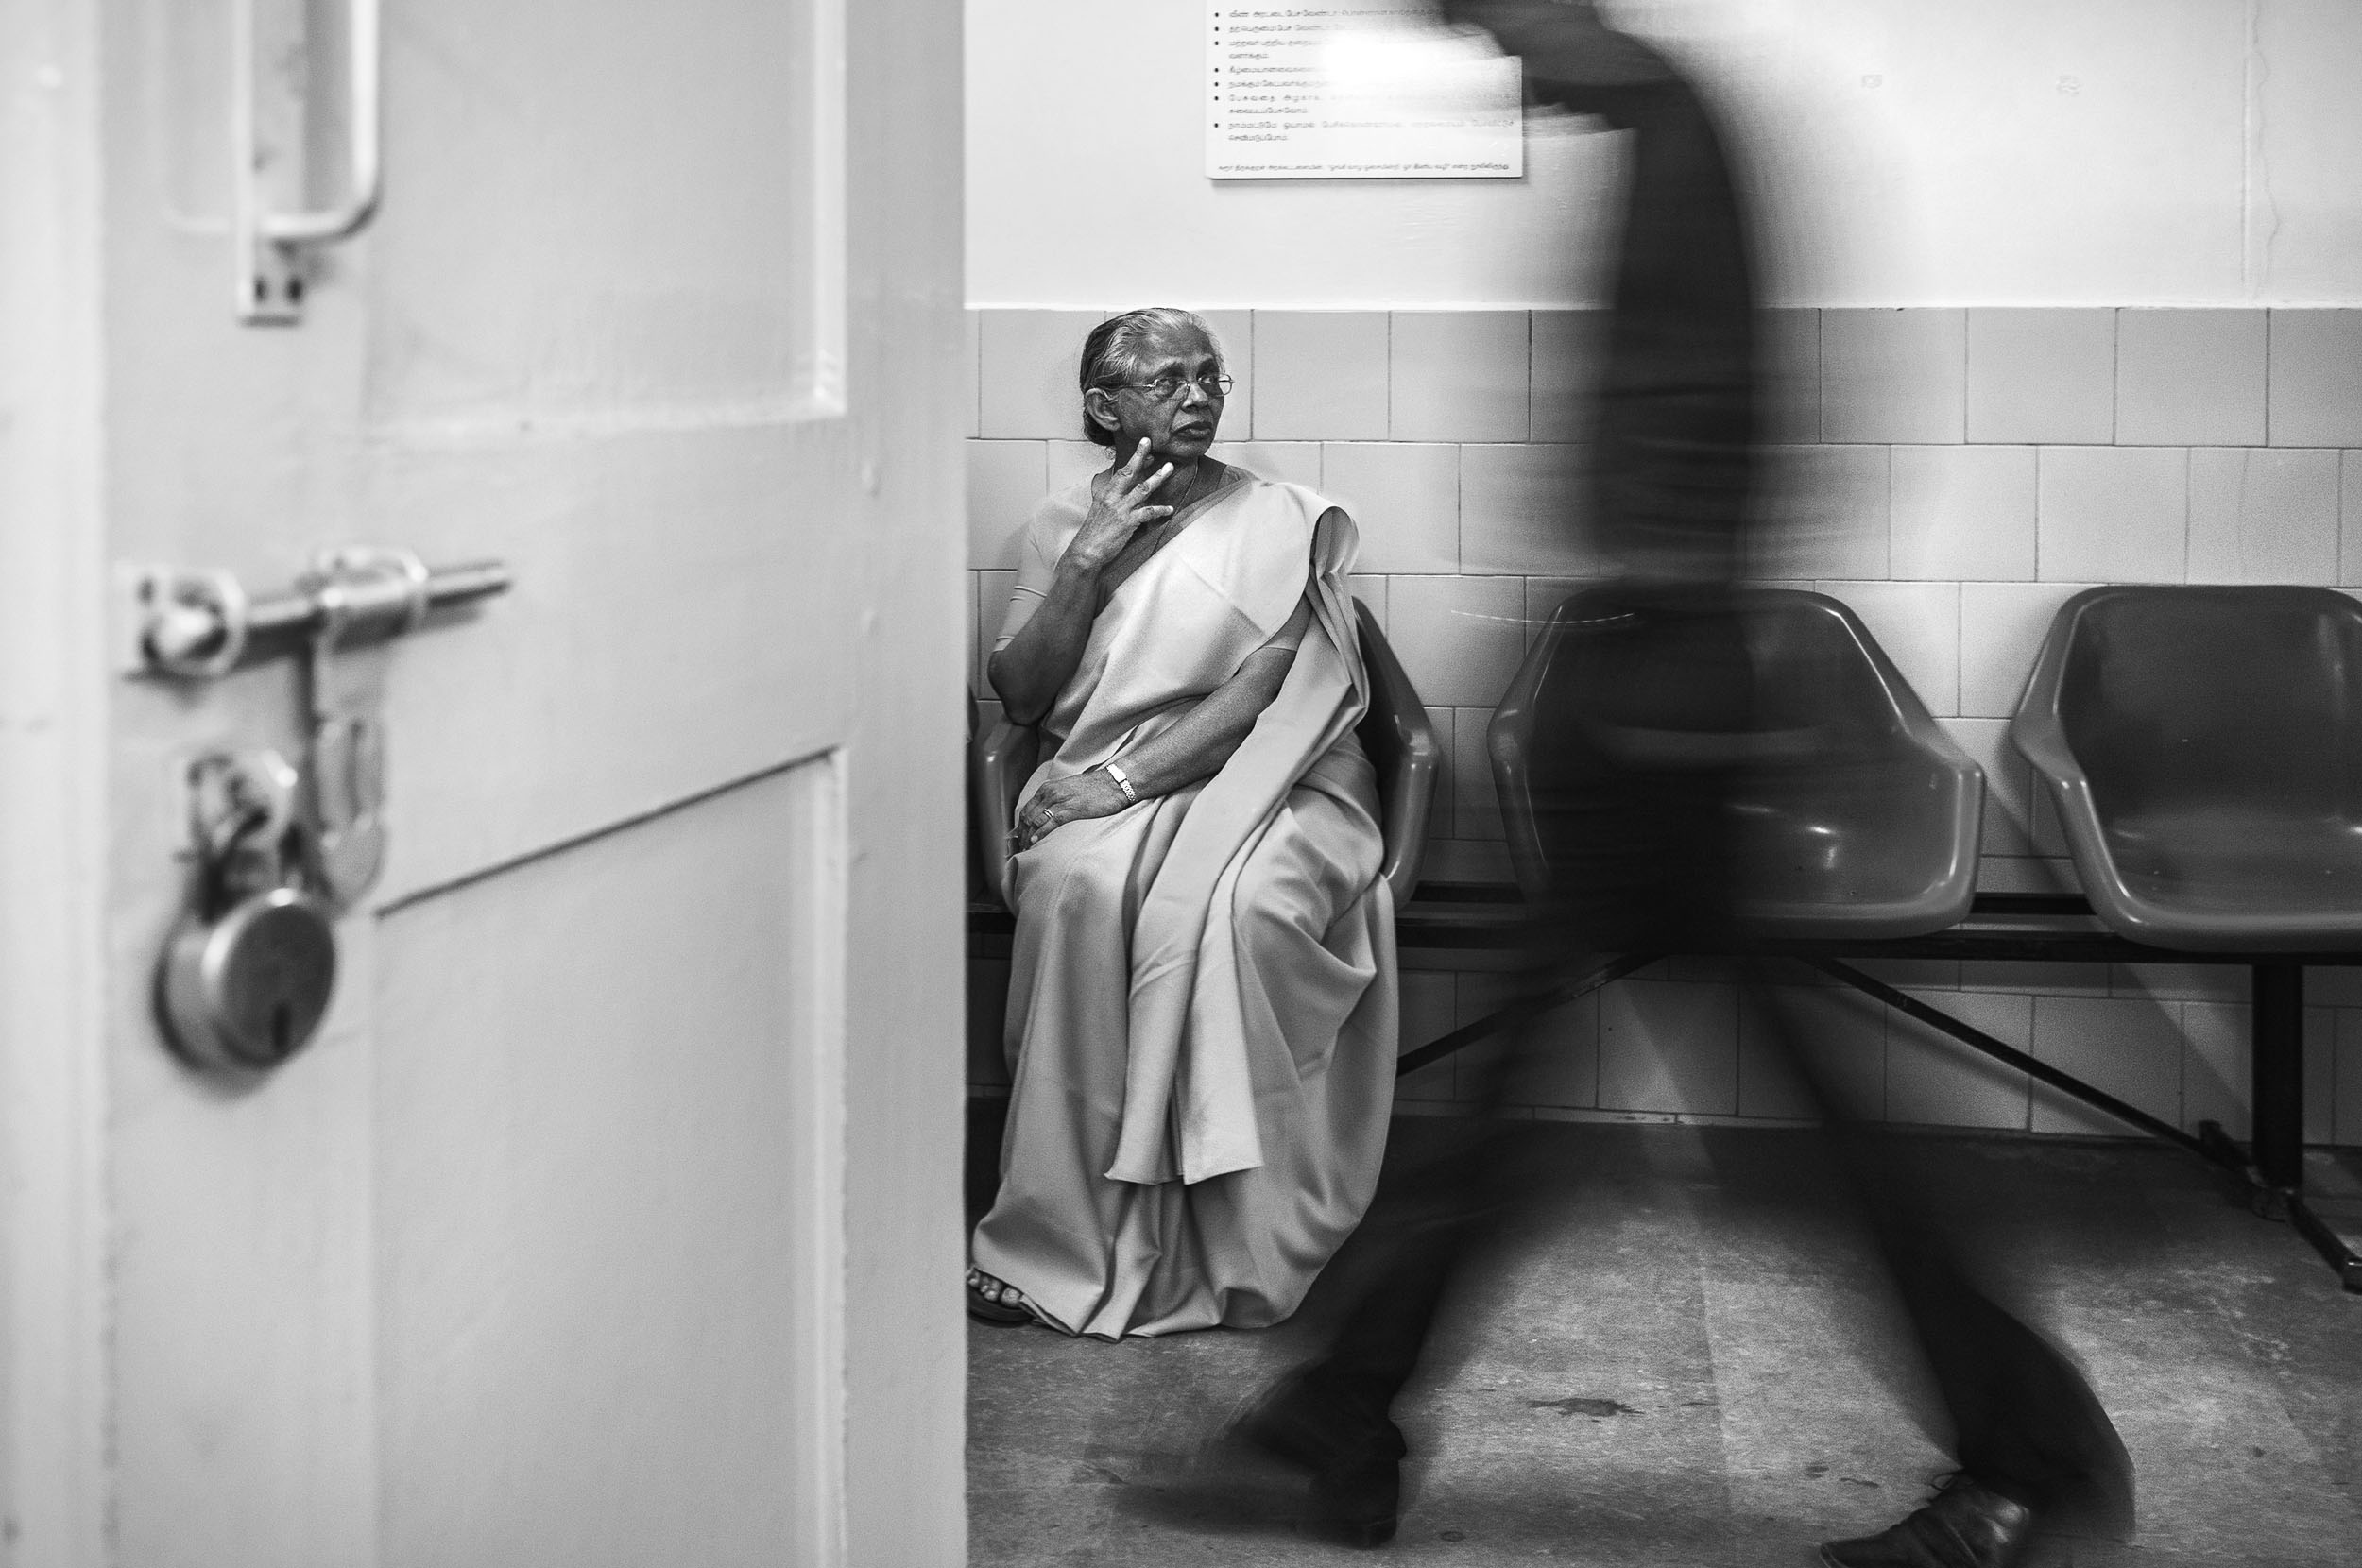 brian-callaway-india-photography-aravind-eye-hospital-42.jpg